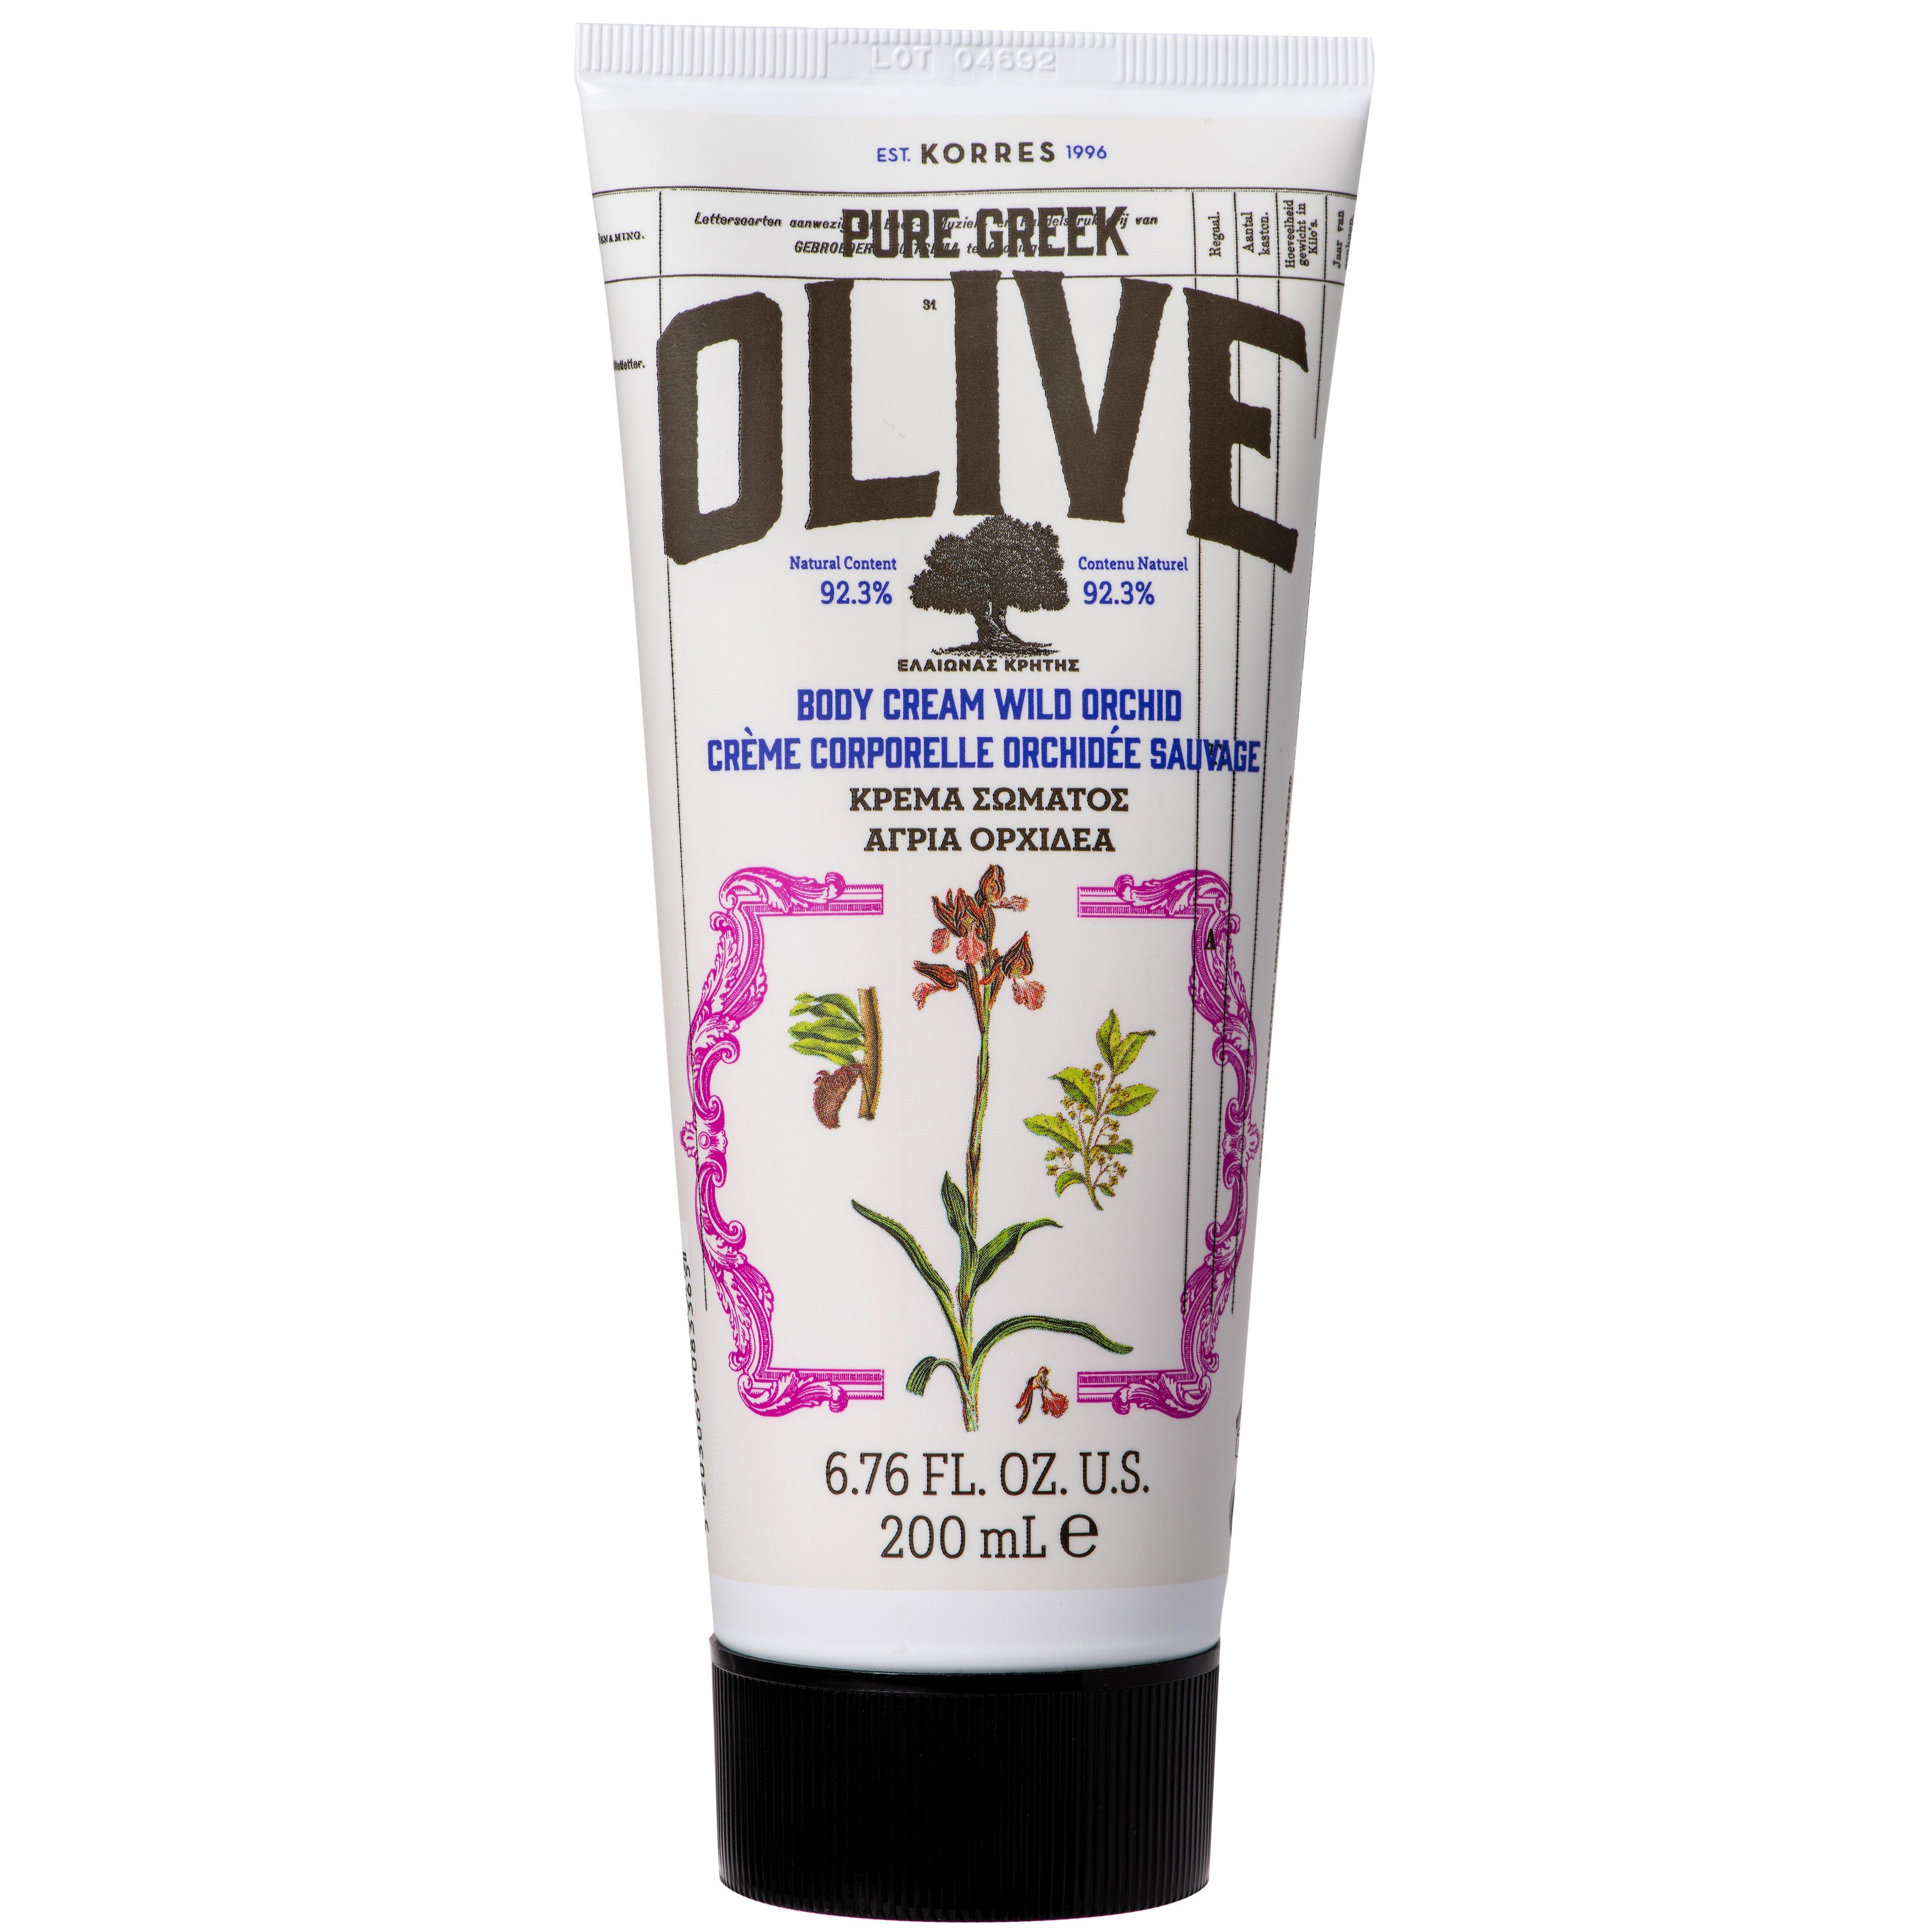 Korres Pure Greek Olive Body Cream Wild Orchid Κρέμα Σώματος με Άγρια Ορχιδέα 200ml